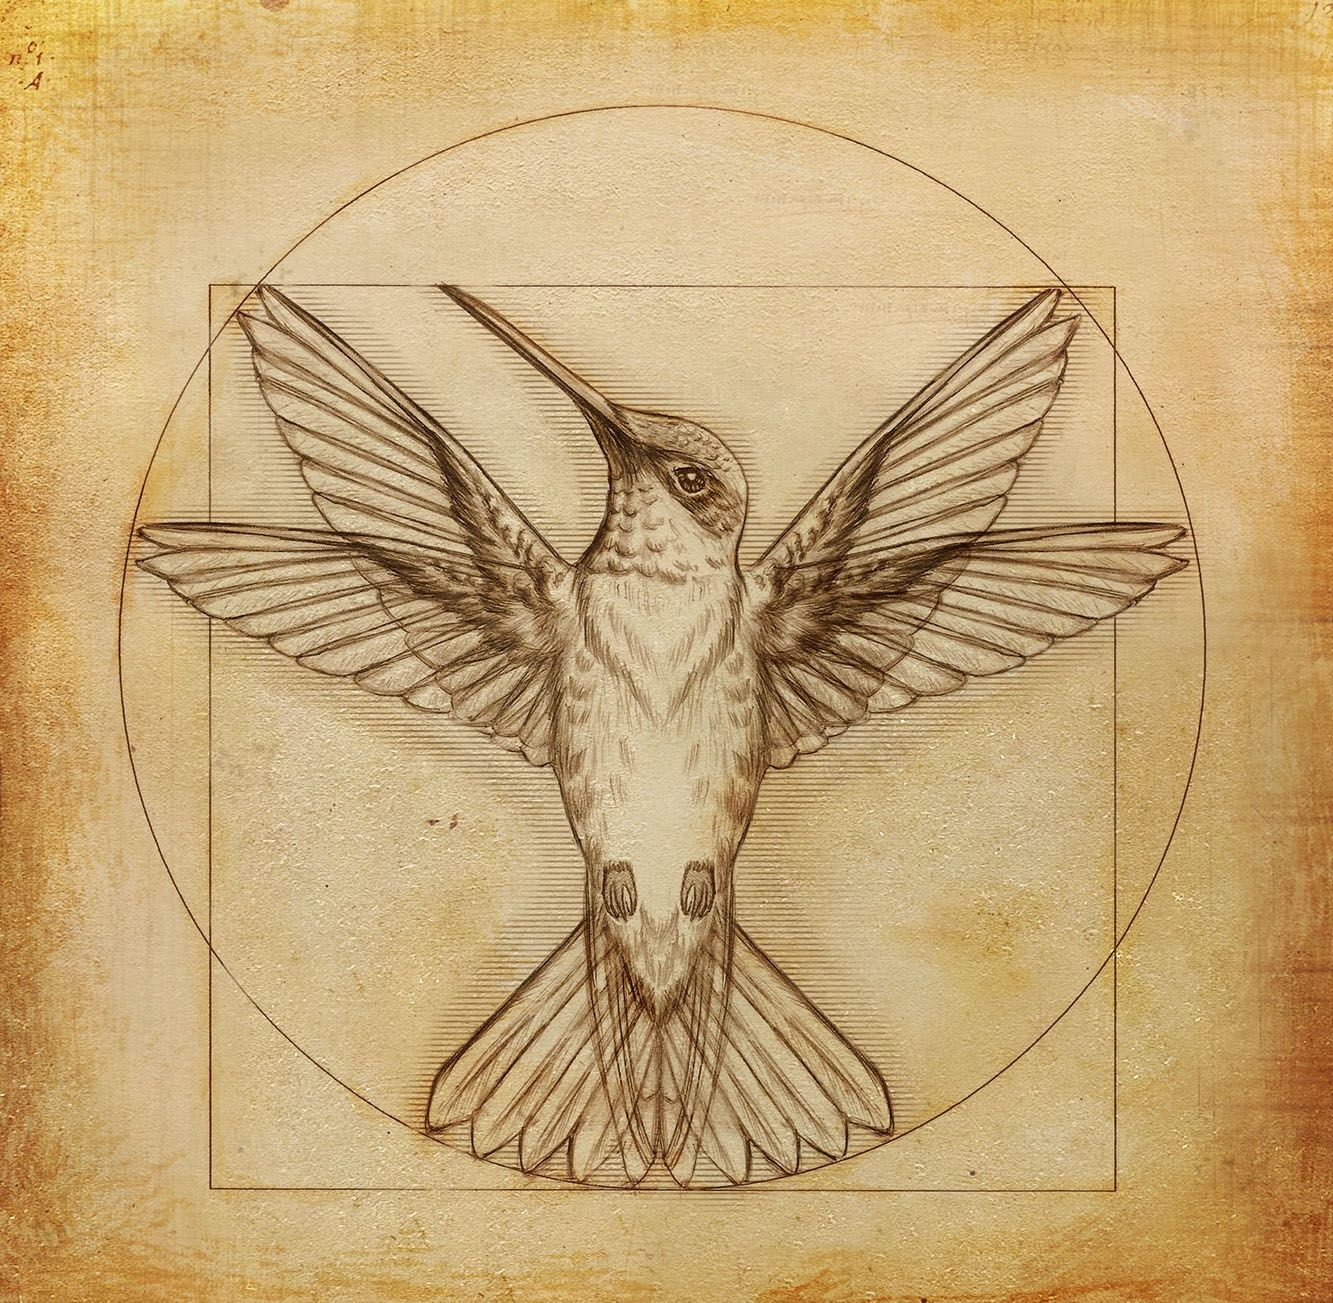 Designs leonardo da vinci hummingbird drawing tattoo contest designs leonardo da vinci hummingbird drawing tattoo contest biocorpaavc Images